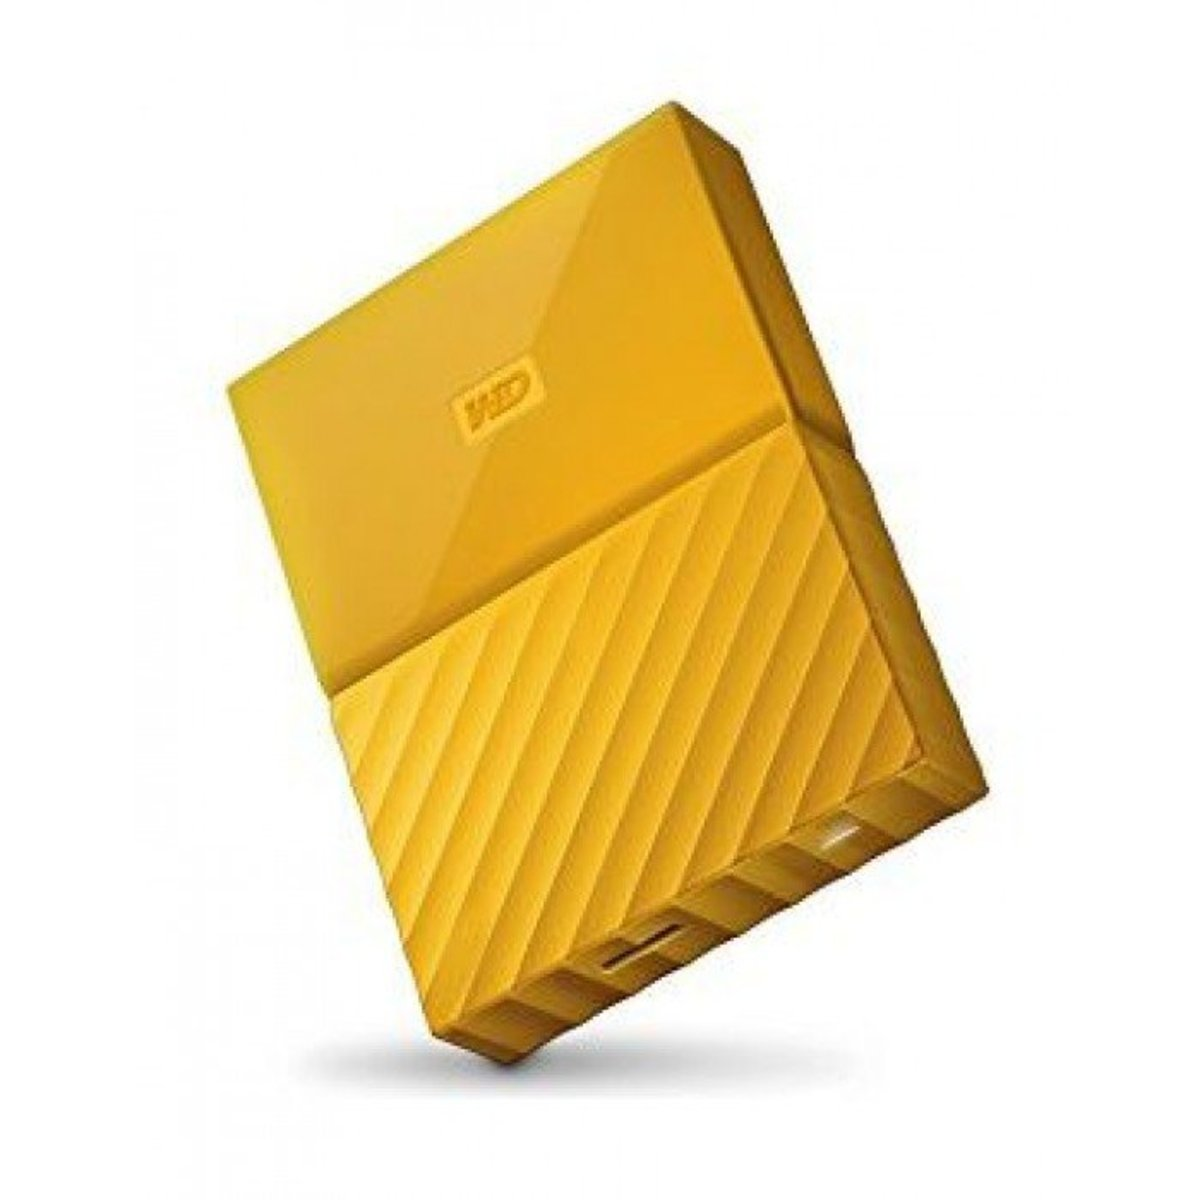 "WD 2.5"" 1TB (YELLOW) My Passport Portable External Hard Drive - USB 3.0 (黃色)"